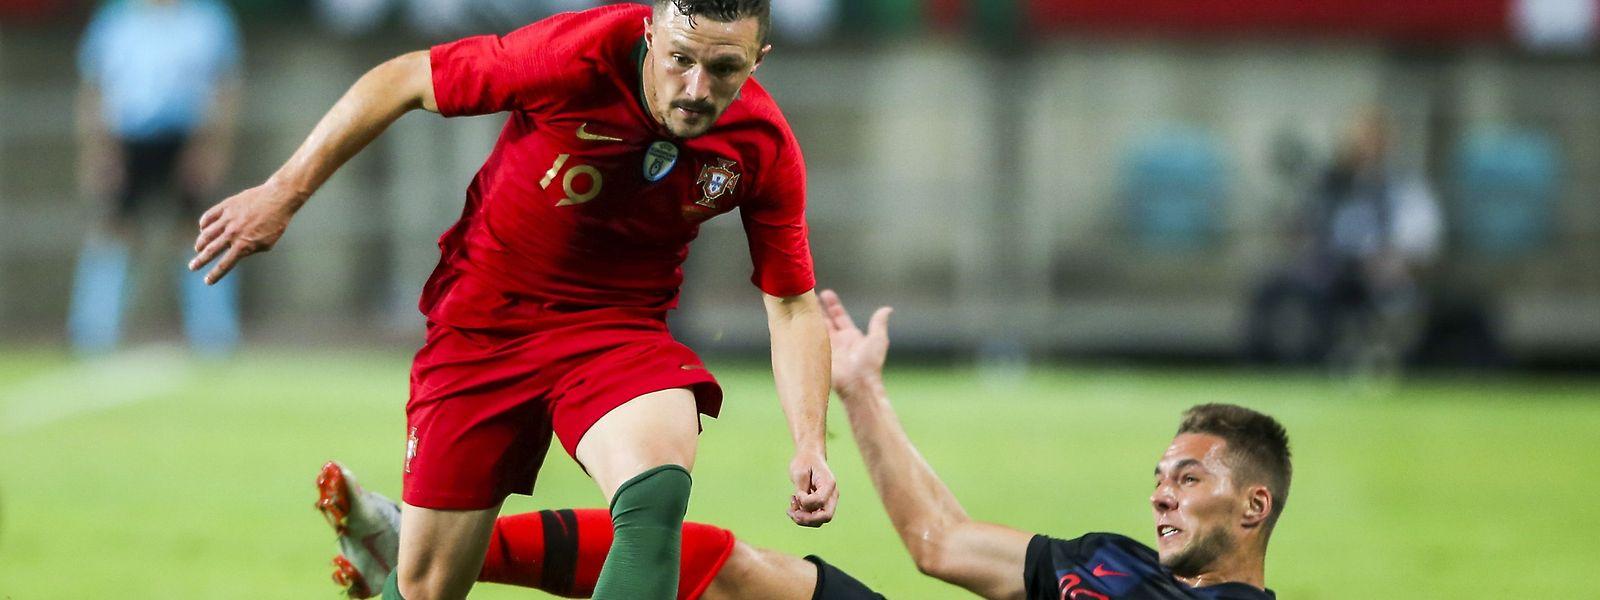 O defesa Mário Rui numa fase de ataque da equipa portuguesa.